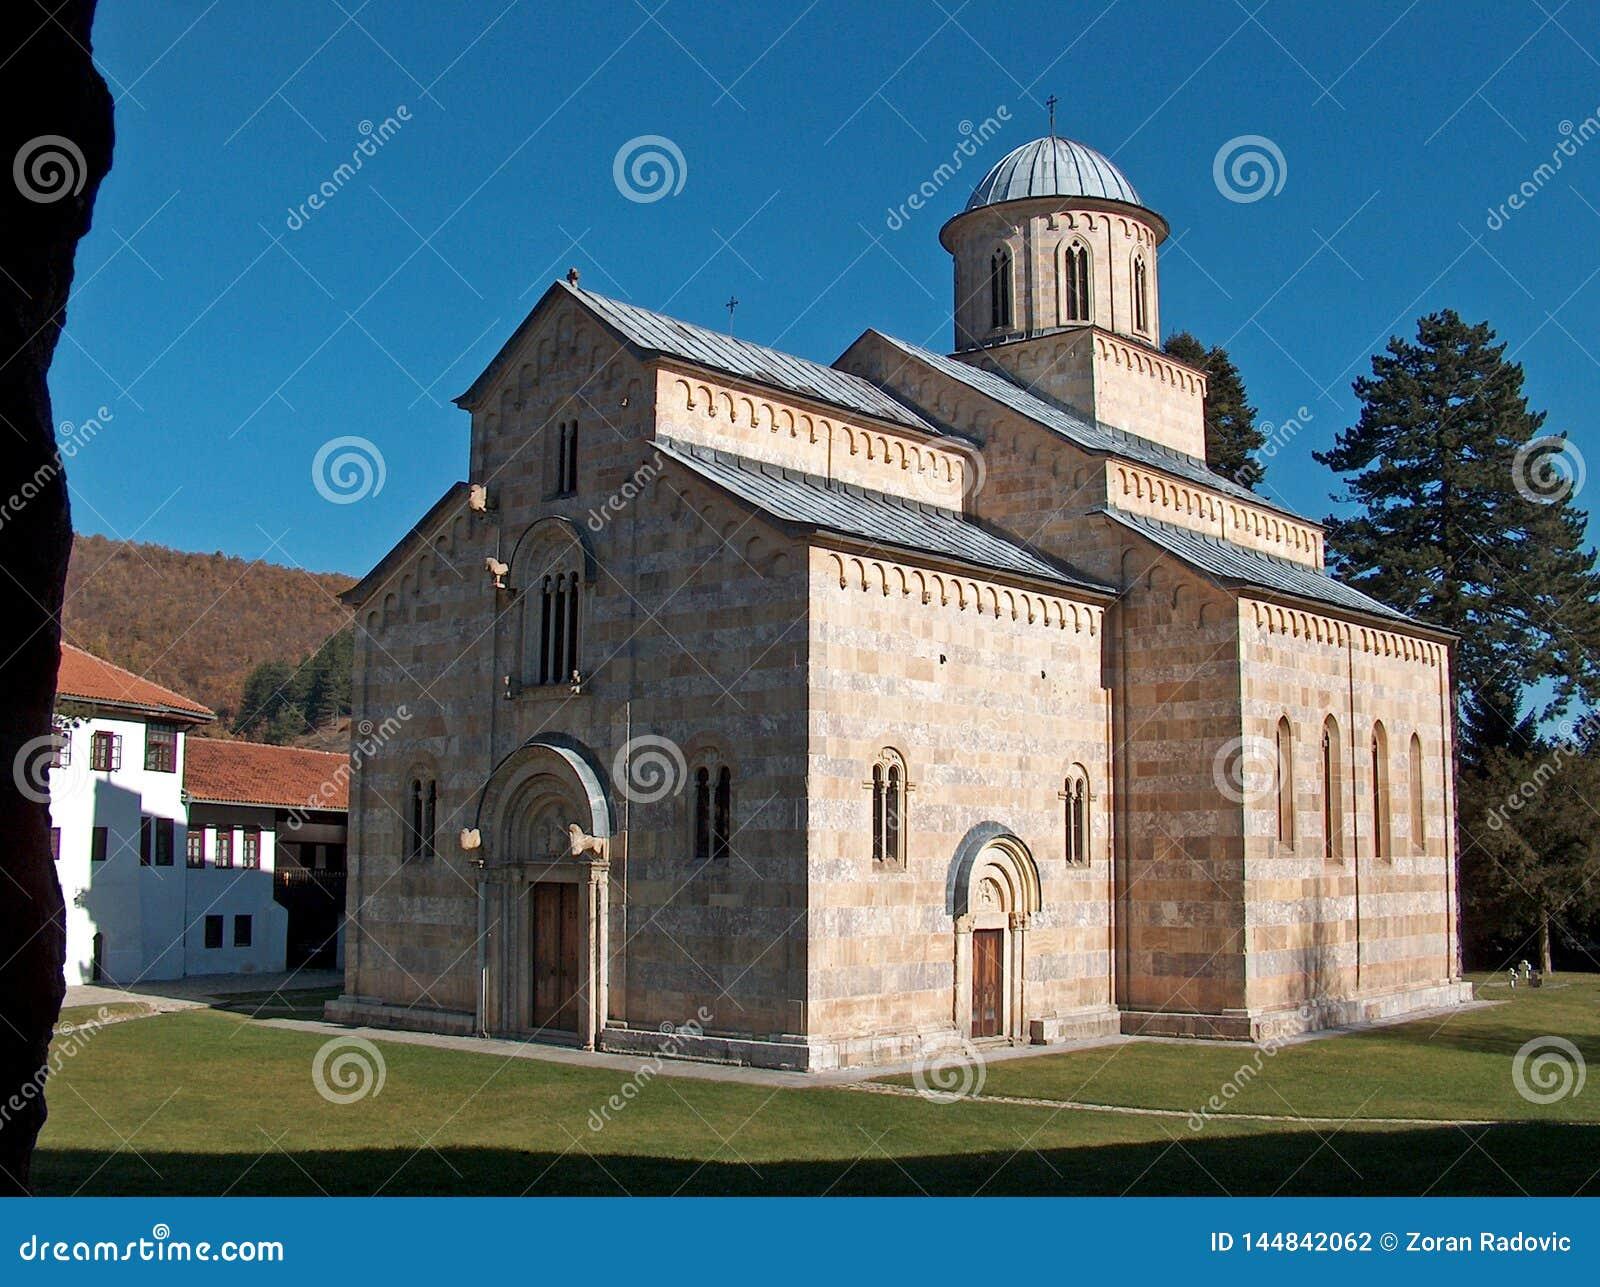 Serbian orthodox monastery Visoki Decani. UNESCO World Heritage.